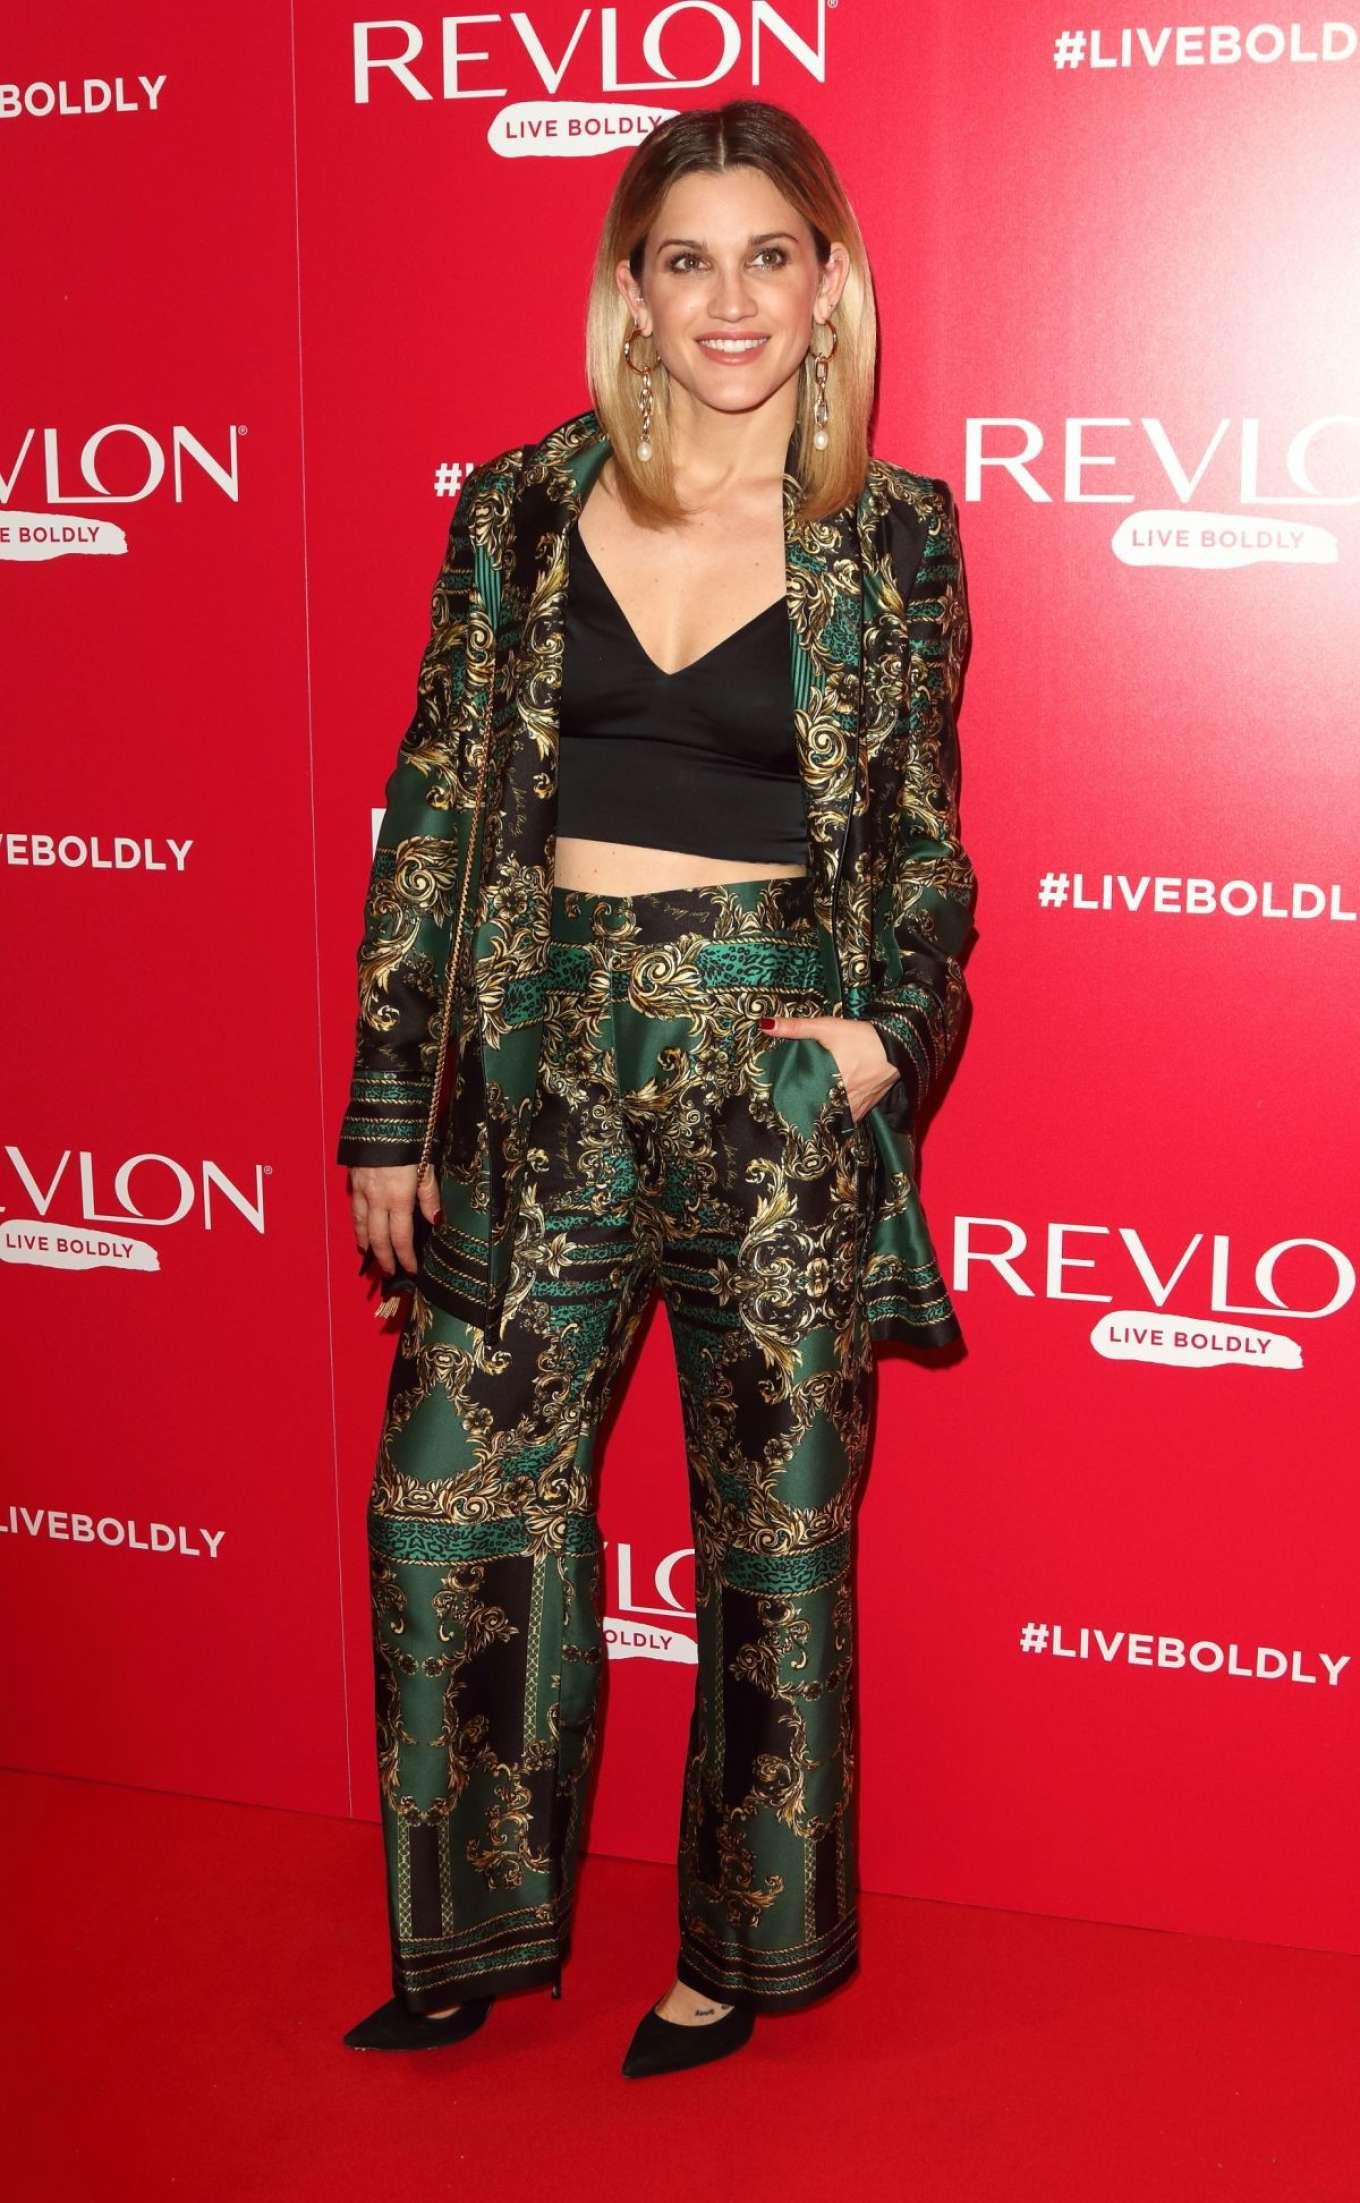 Ashley Roberts - Adwoa Aboah x Revlon Boldly Party in London